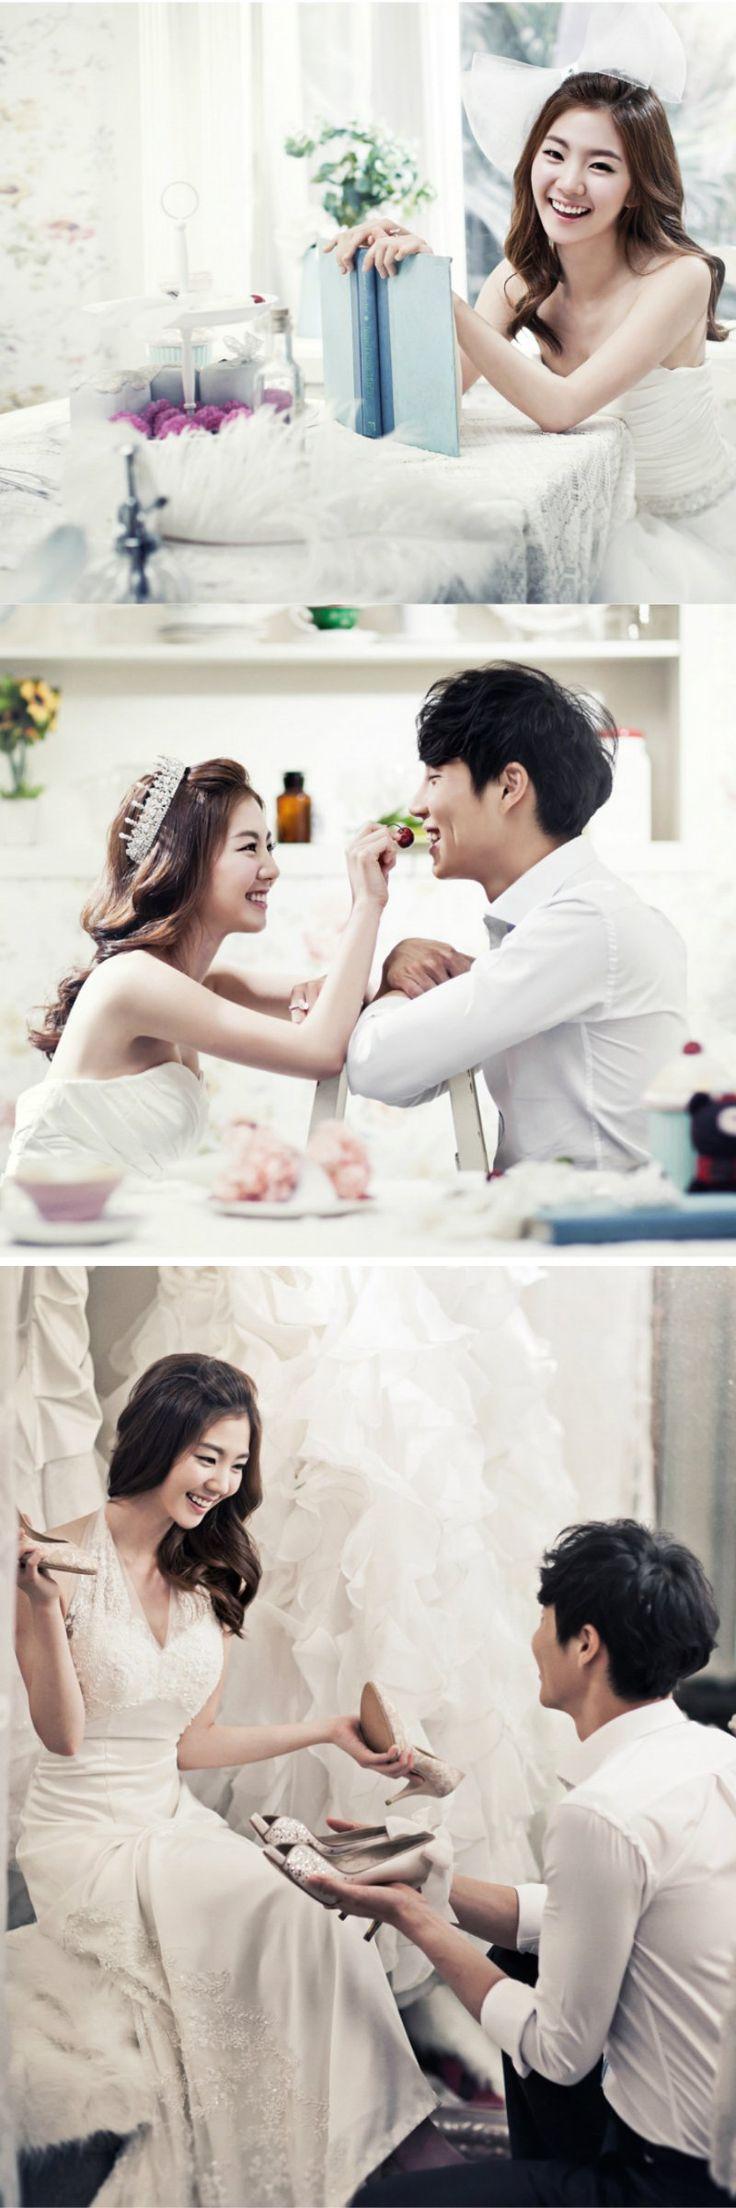 Elegant Korea wedding concept photos in studio